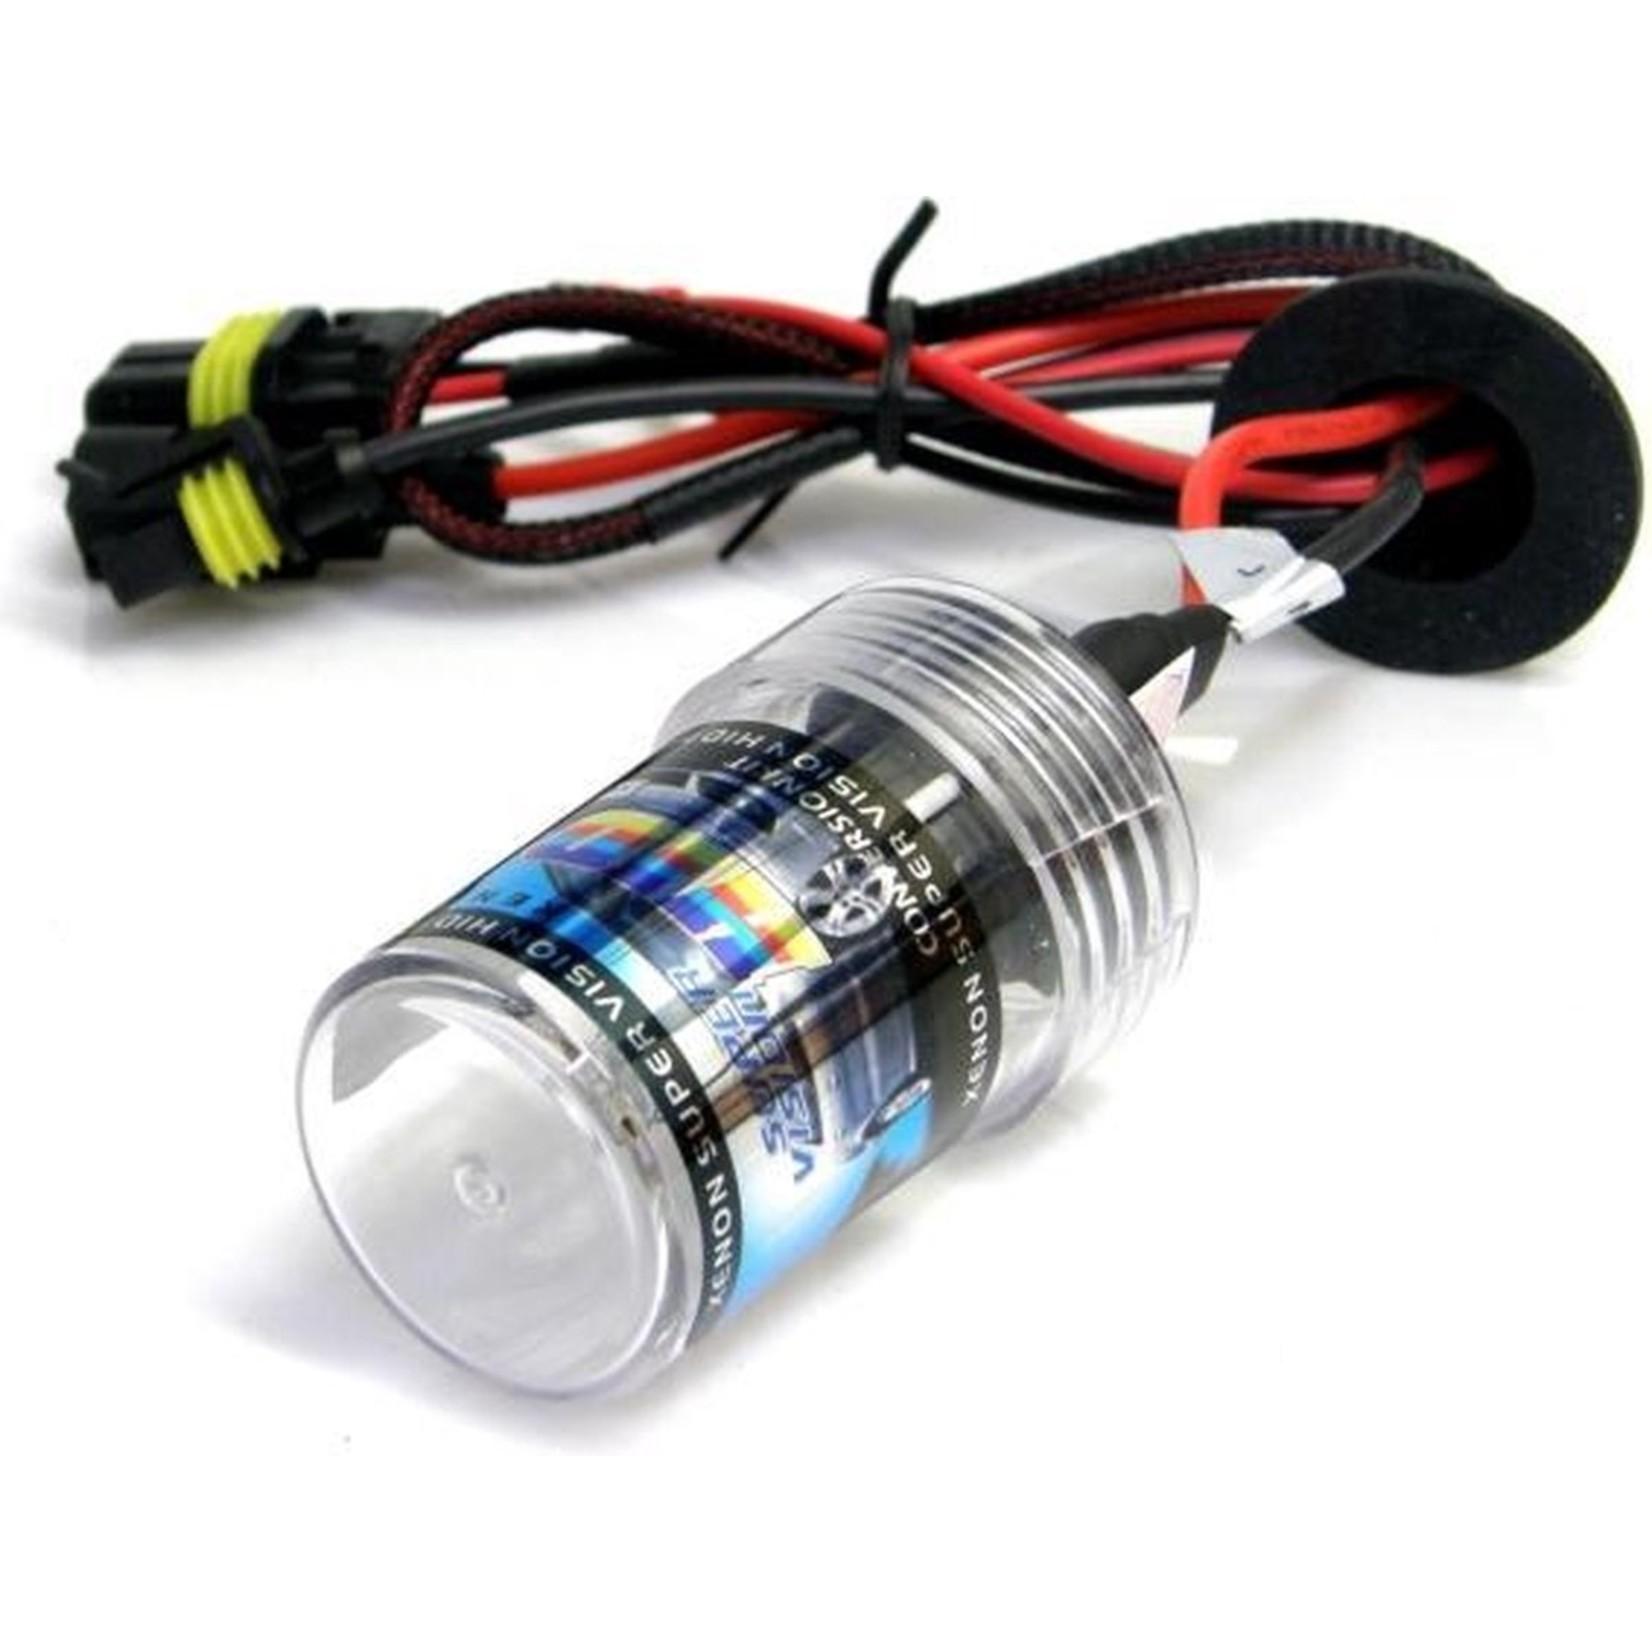 XEOD H7 Xenon vervangingslamp